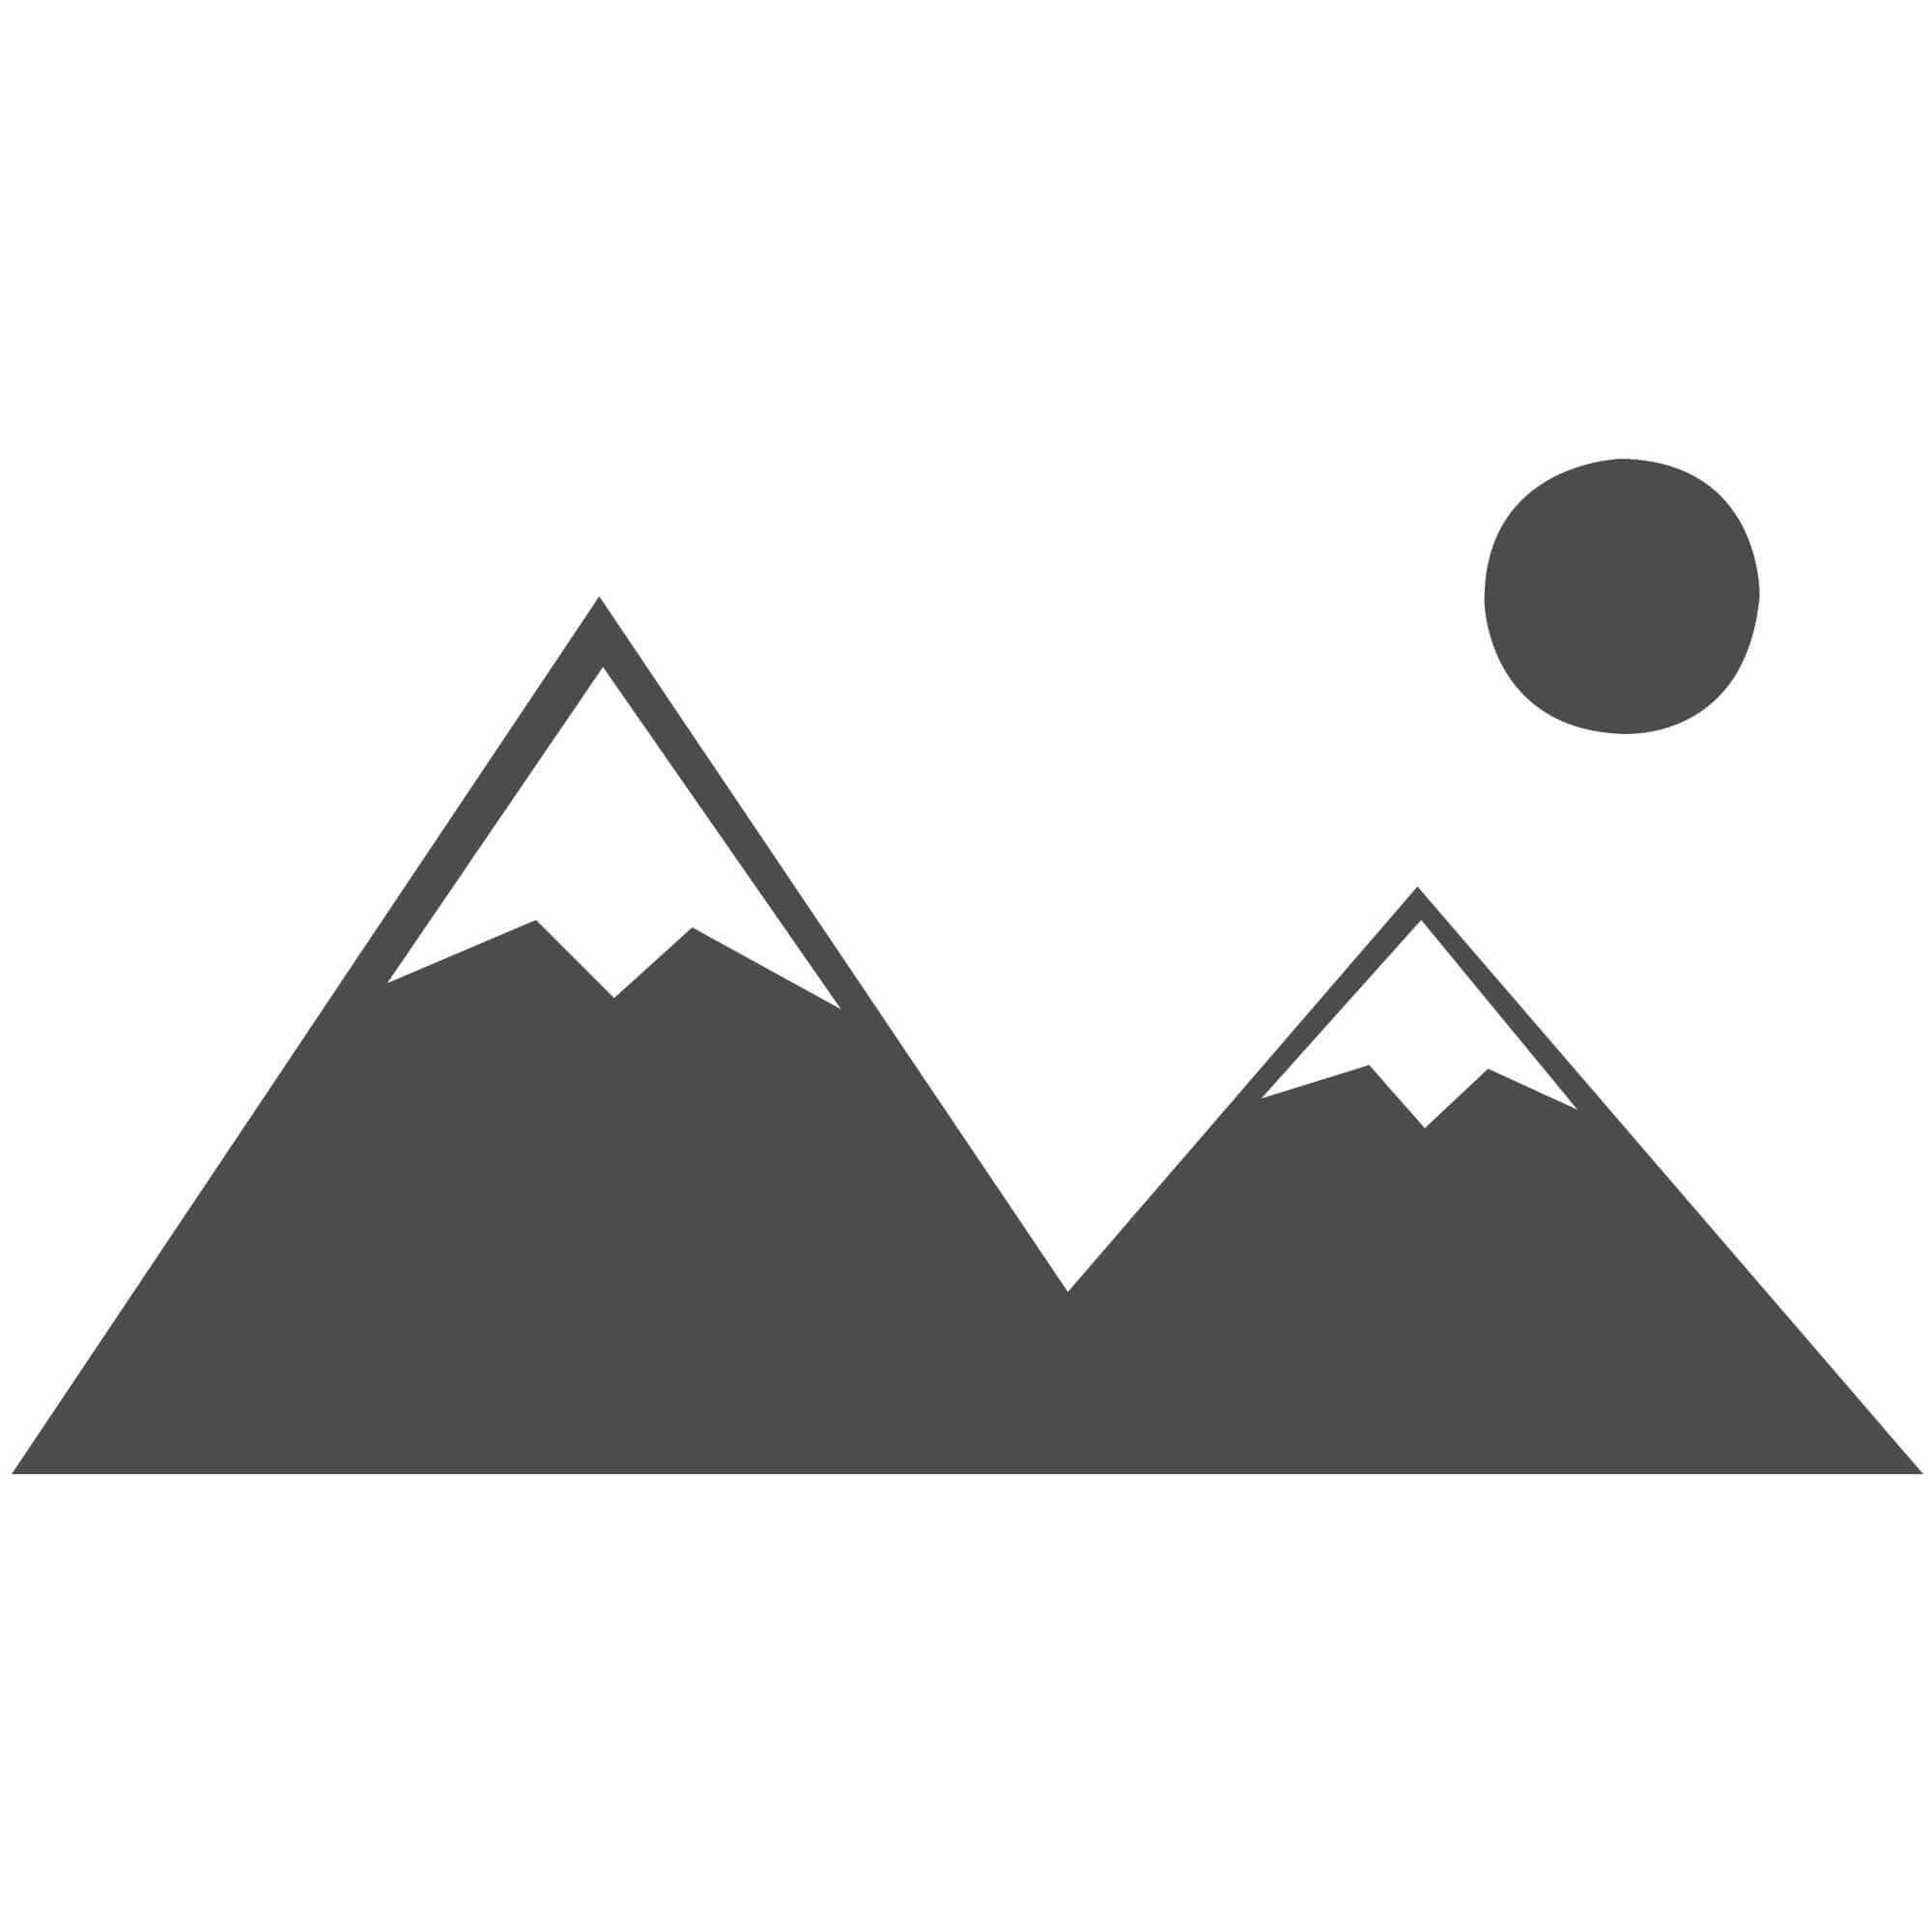 "Griot Stripe Rug - Erikundi - KI806 Masala-160 x 226 cm (5'3"" x 7'5"")"